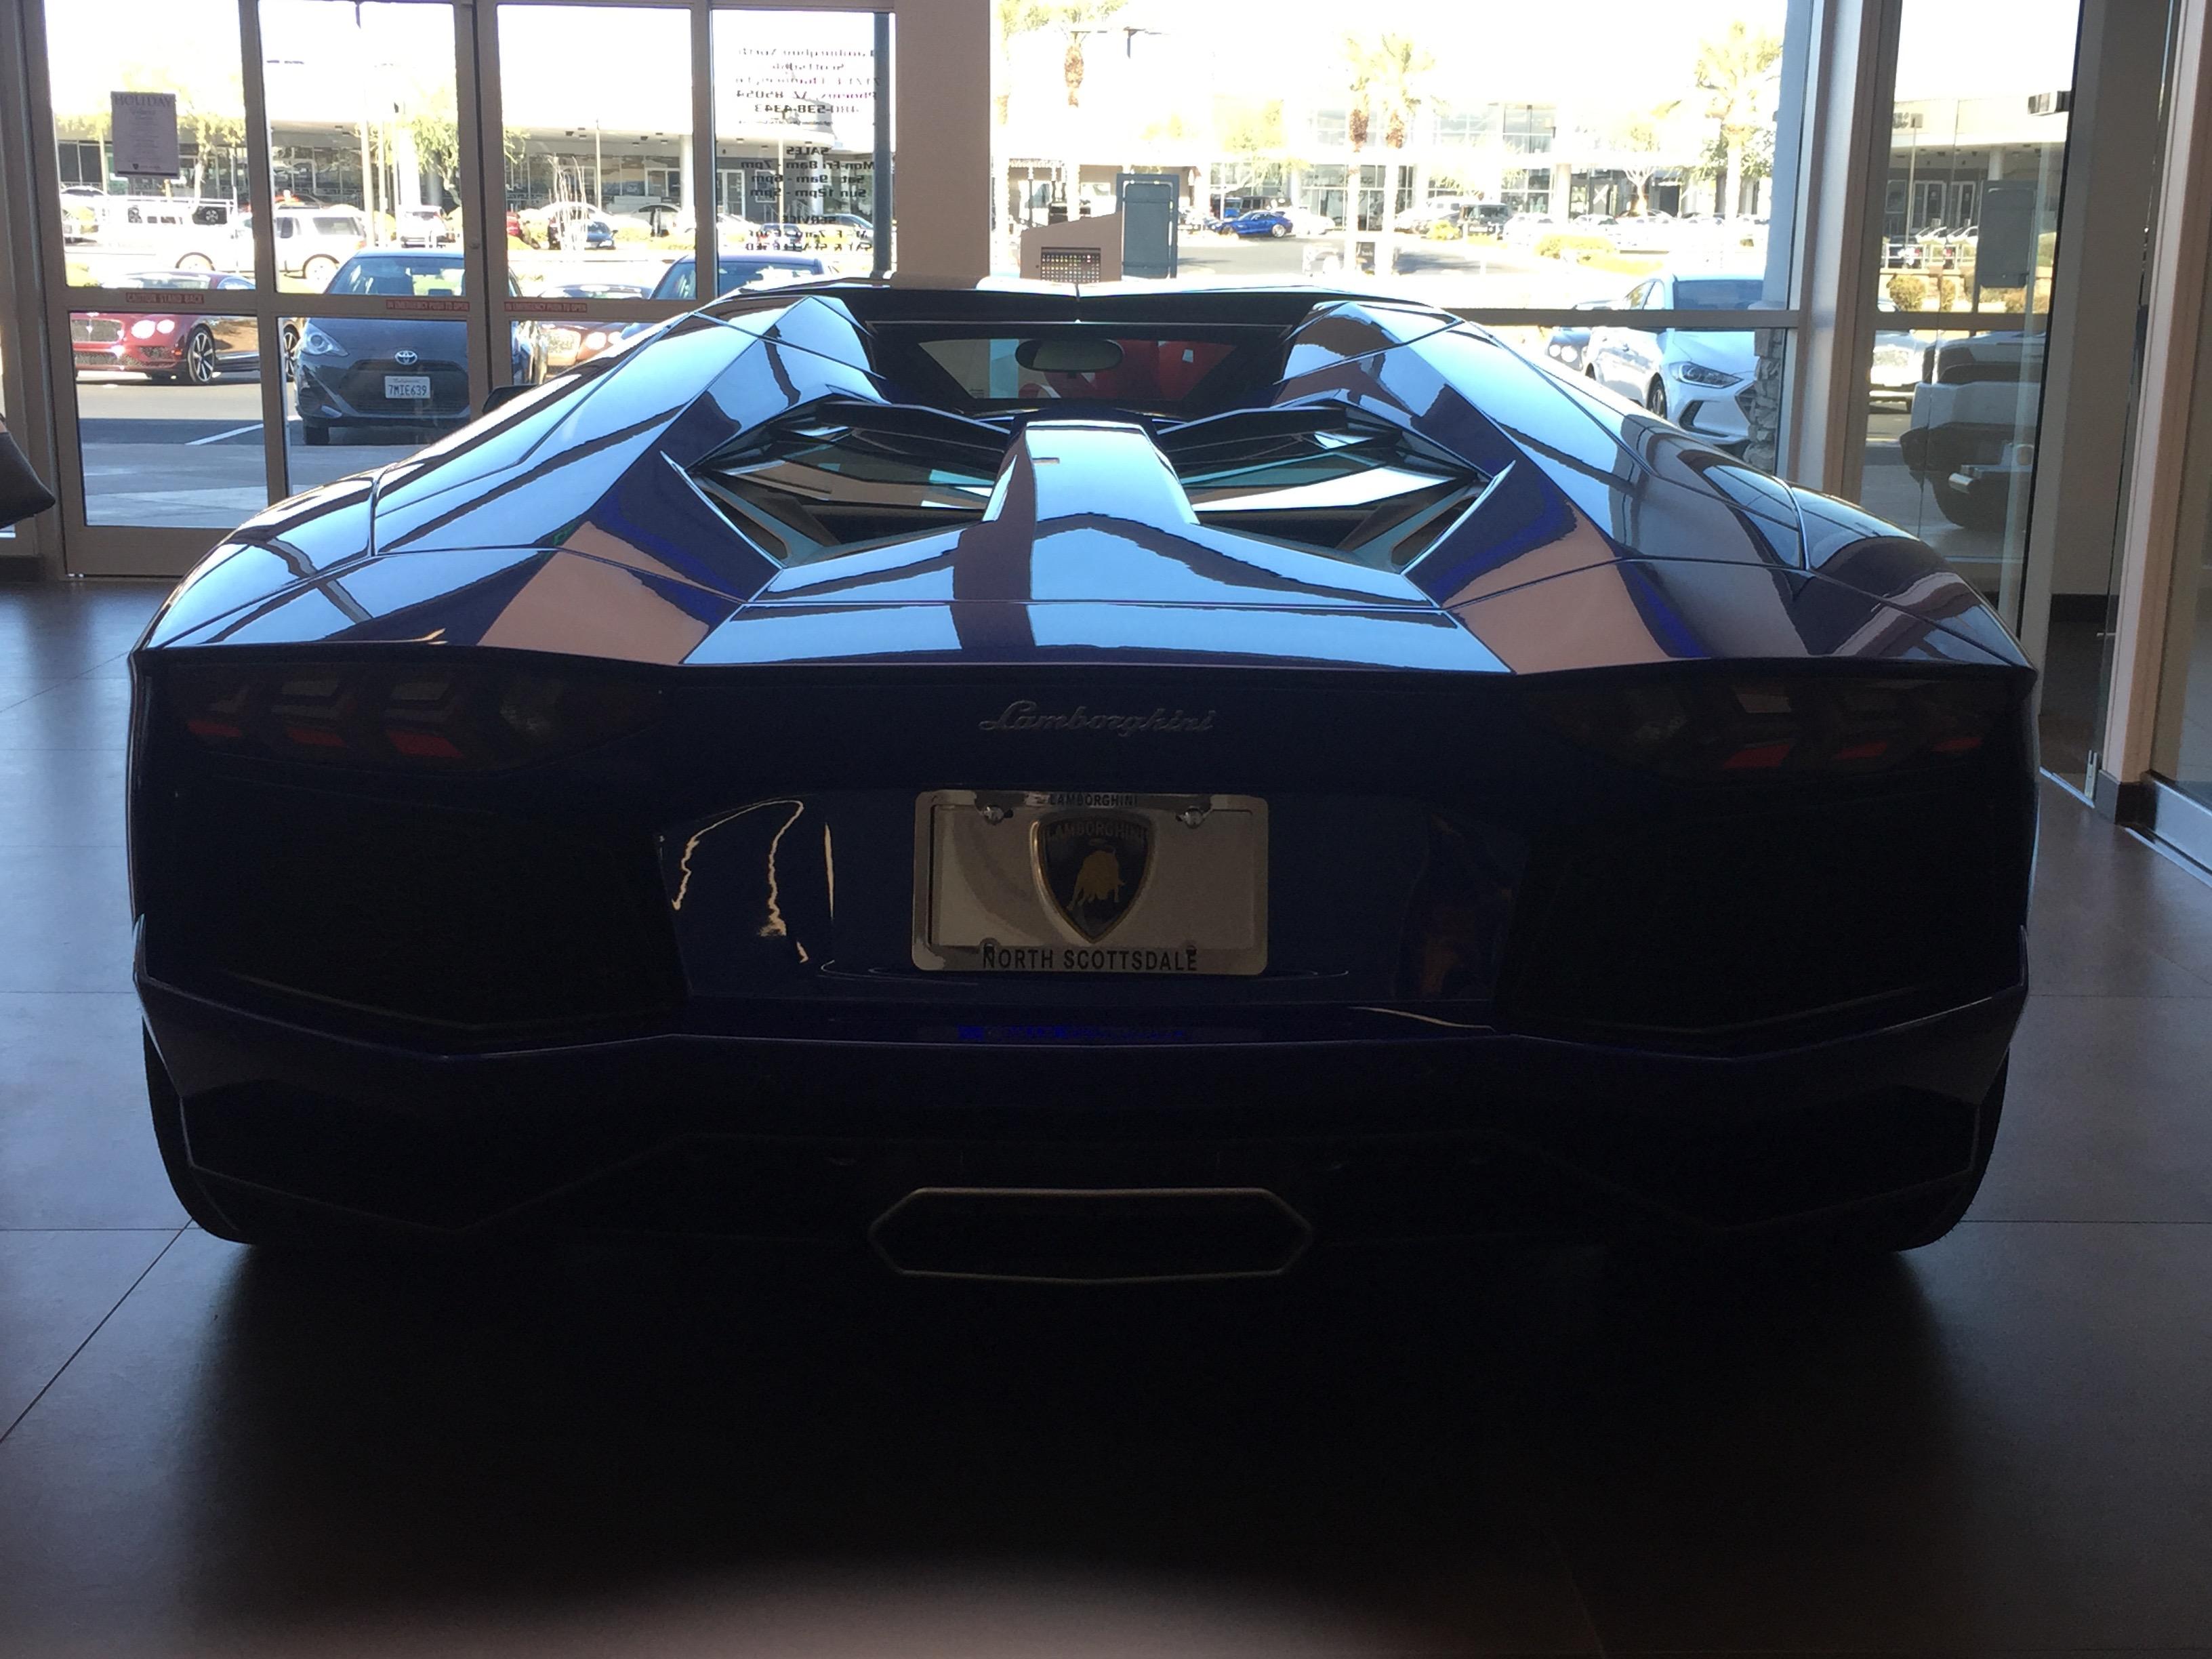 Purple Lamborghini Just Like The Song